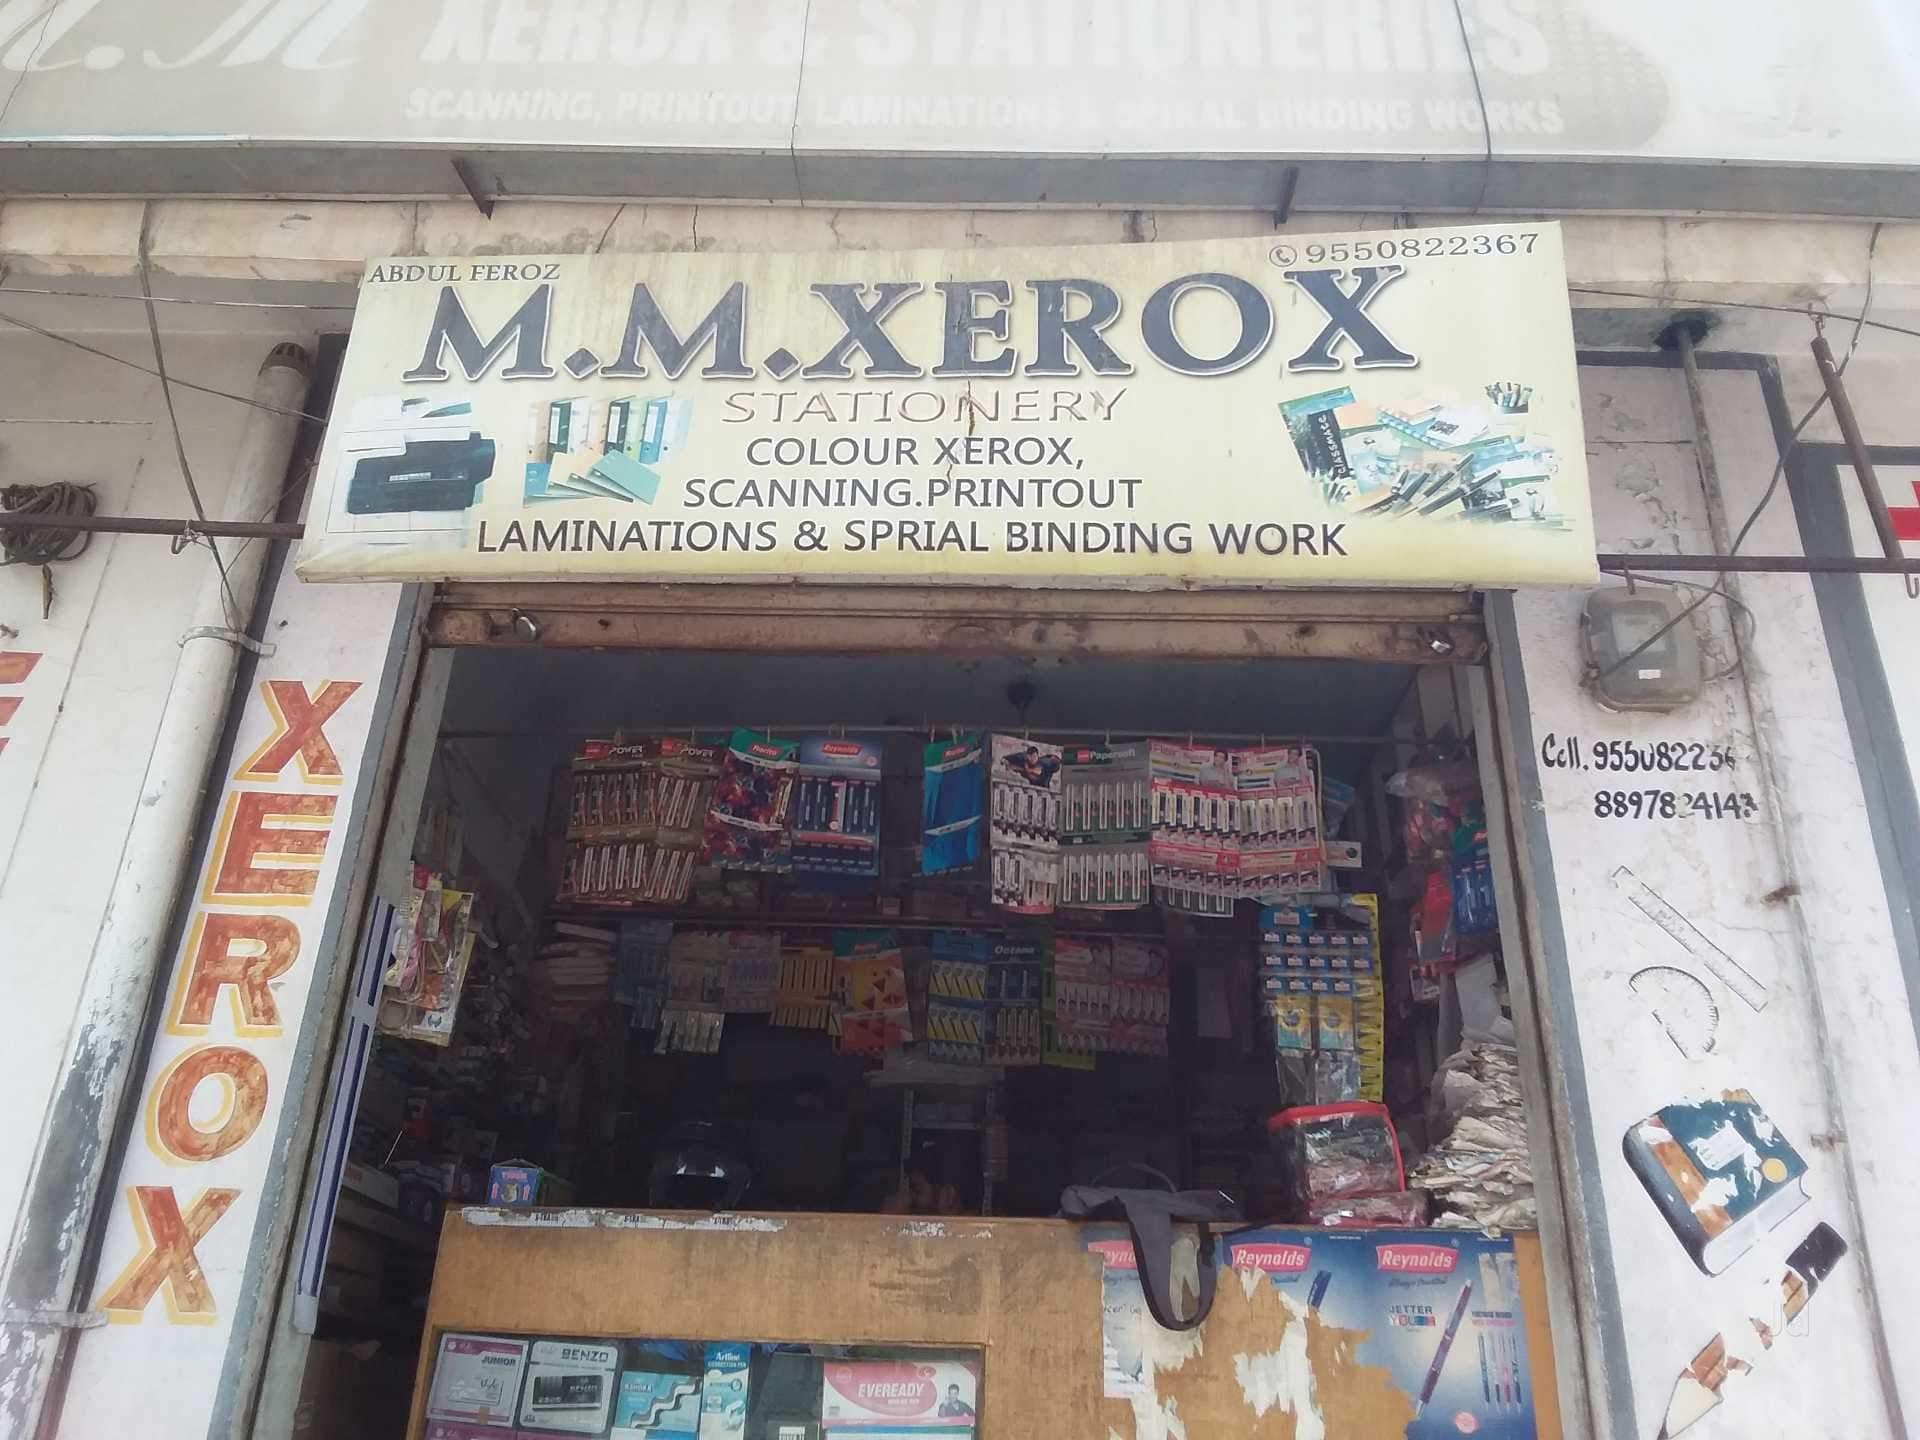 Top 10 Stationery Shops in Kismatpura, Hyderabad - Best